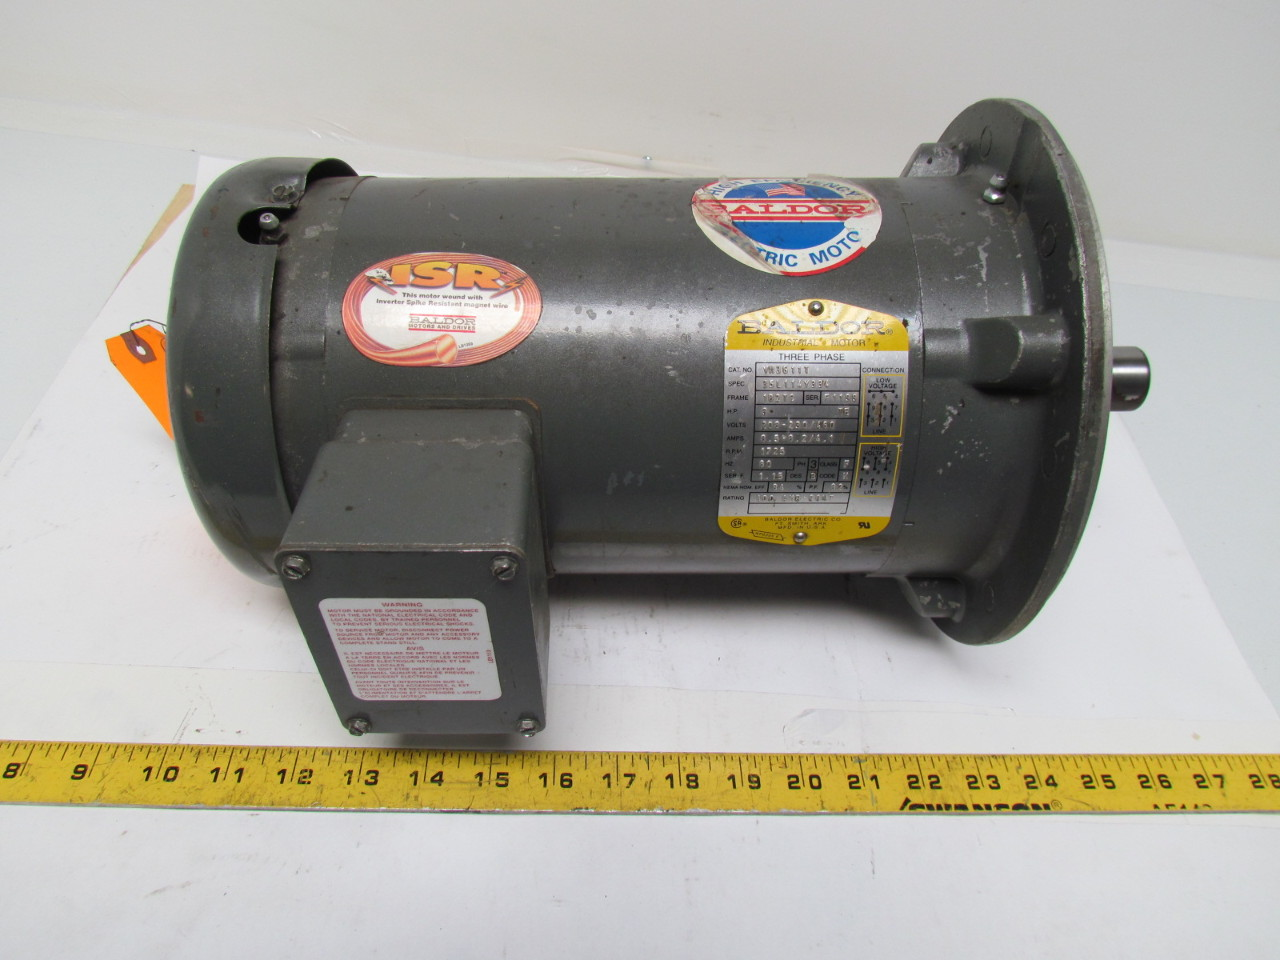 Baldor Vm3611t Ac Motor 3hp 3 Ph 208 230 460v 1725 Rpm